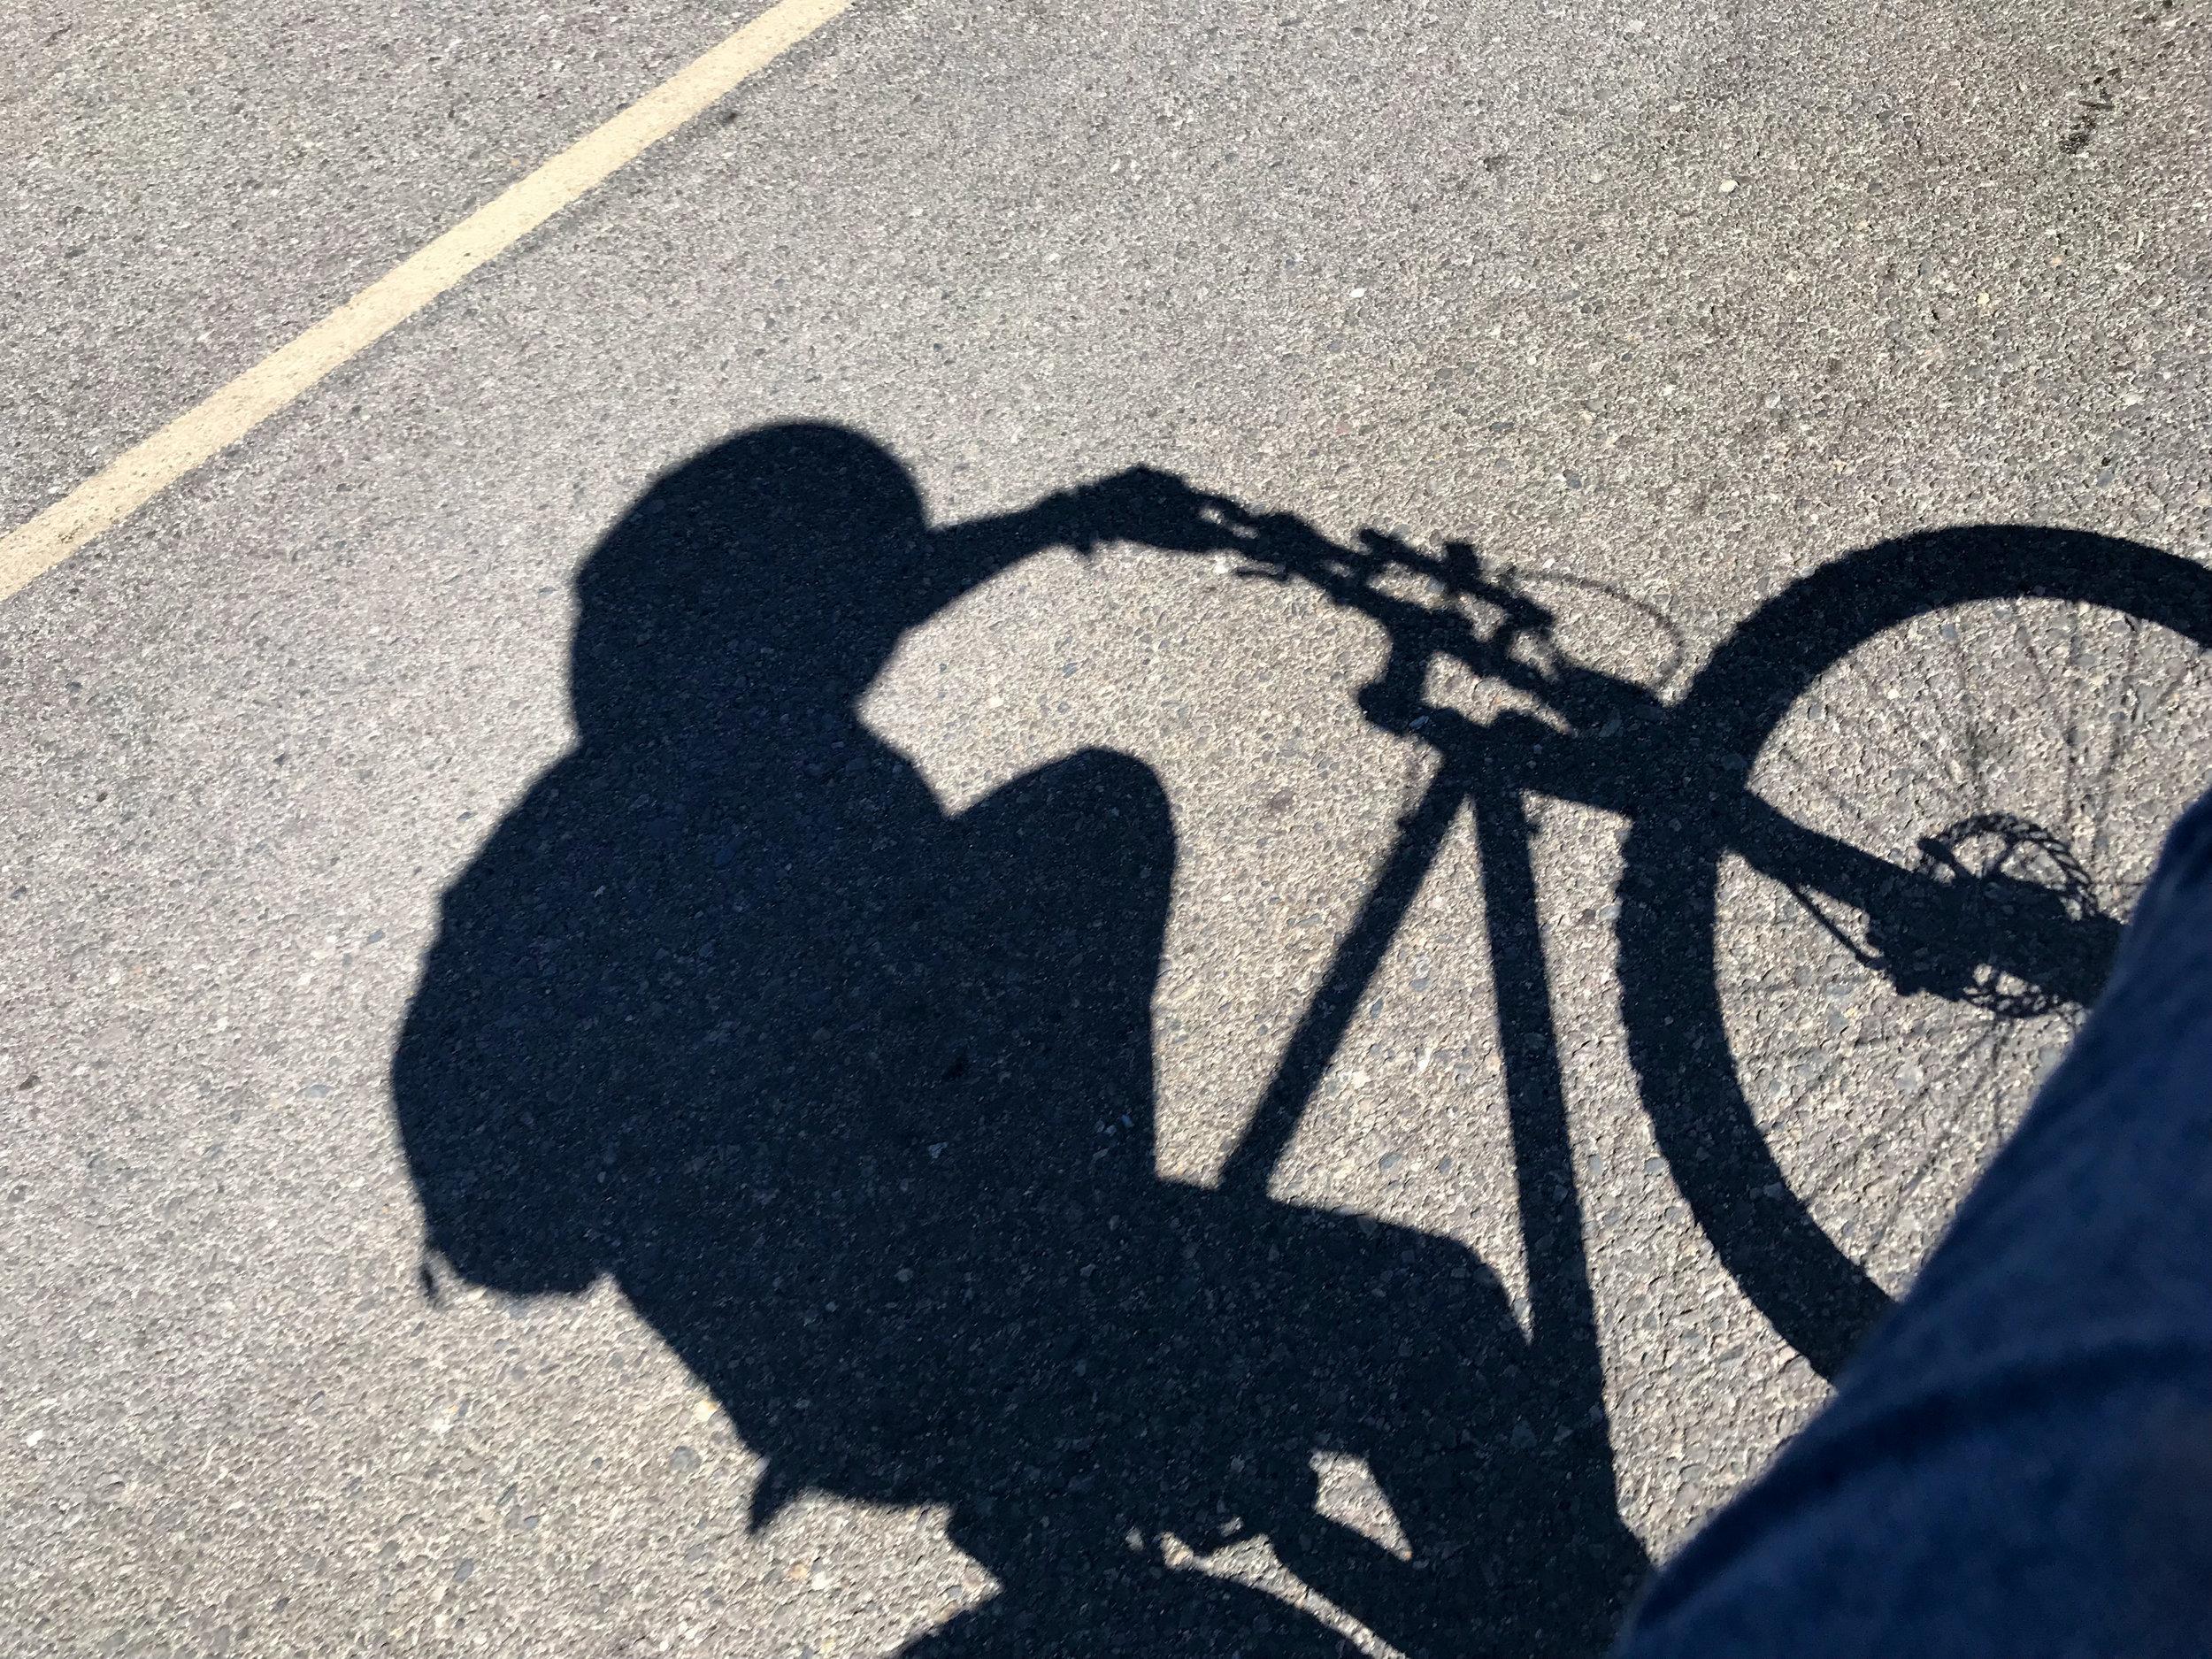 BDLA bike ride shadow.JPG